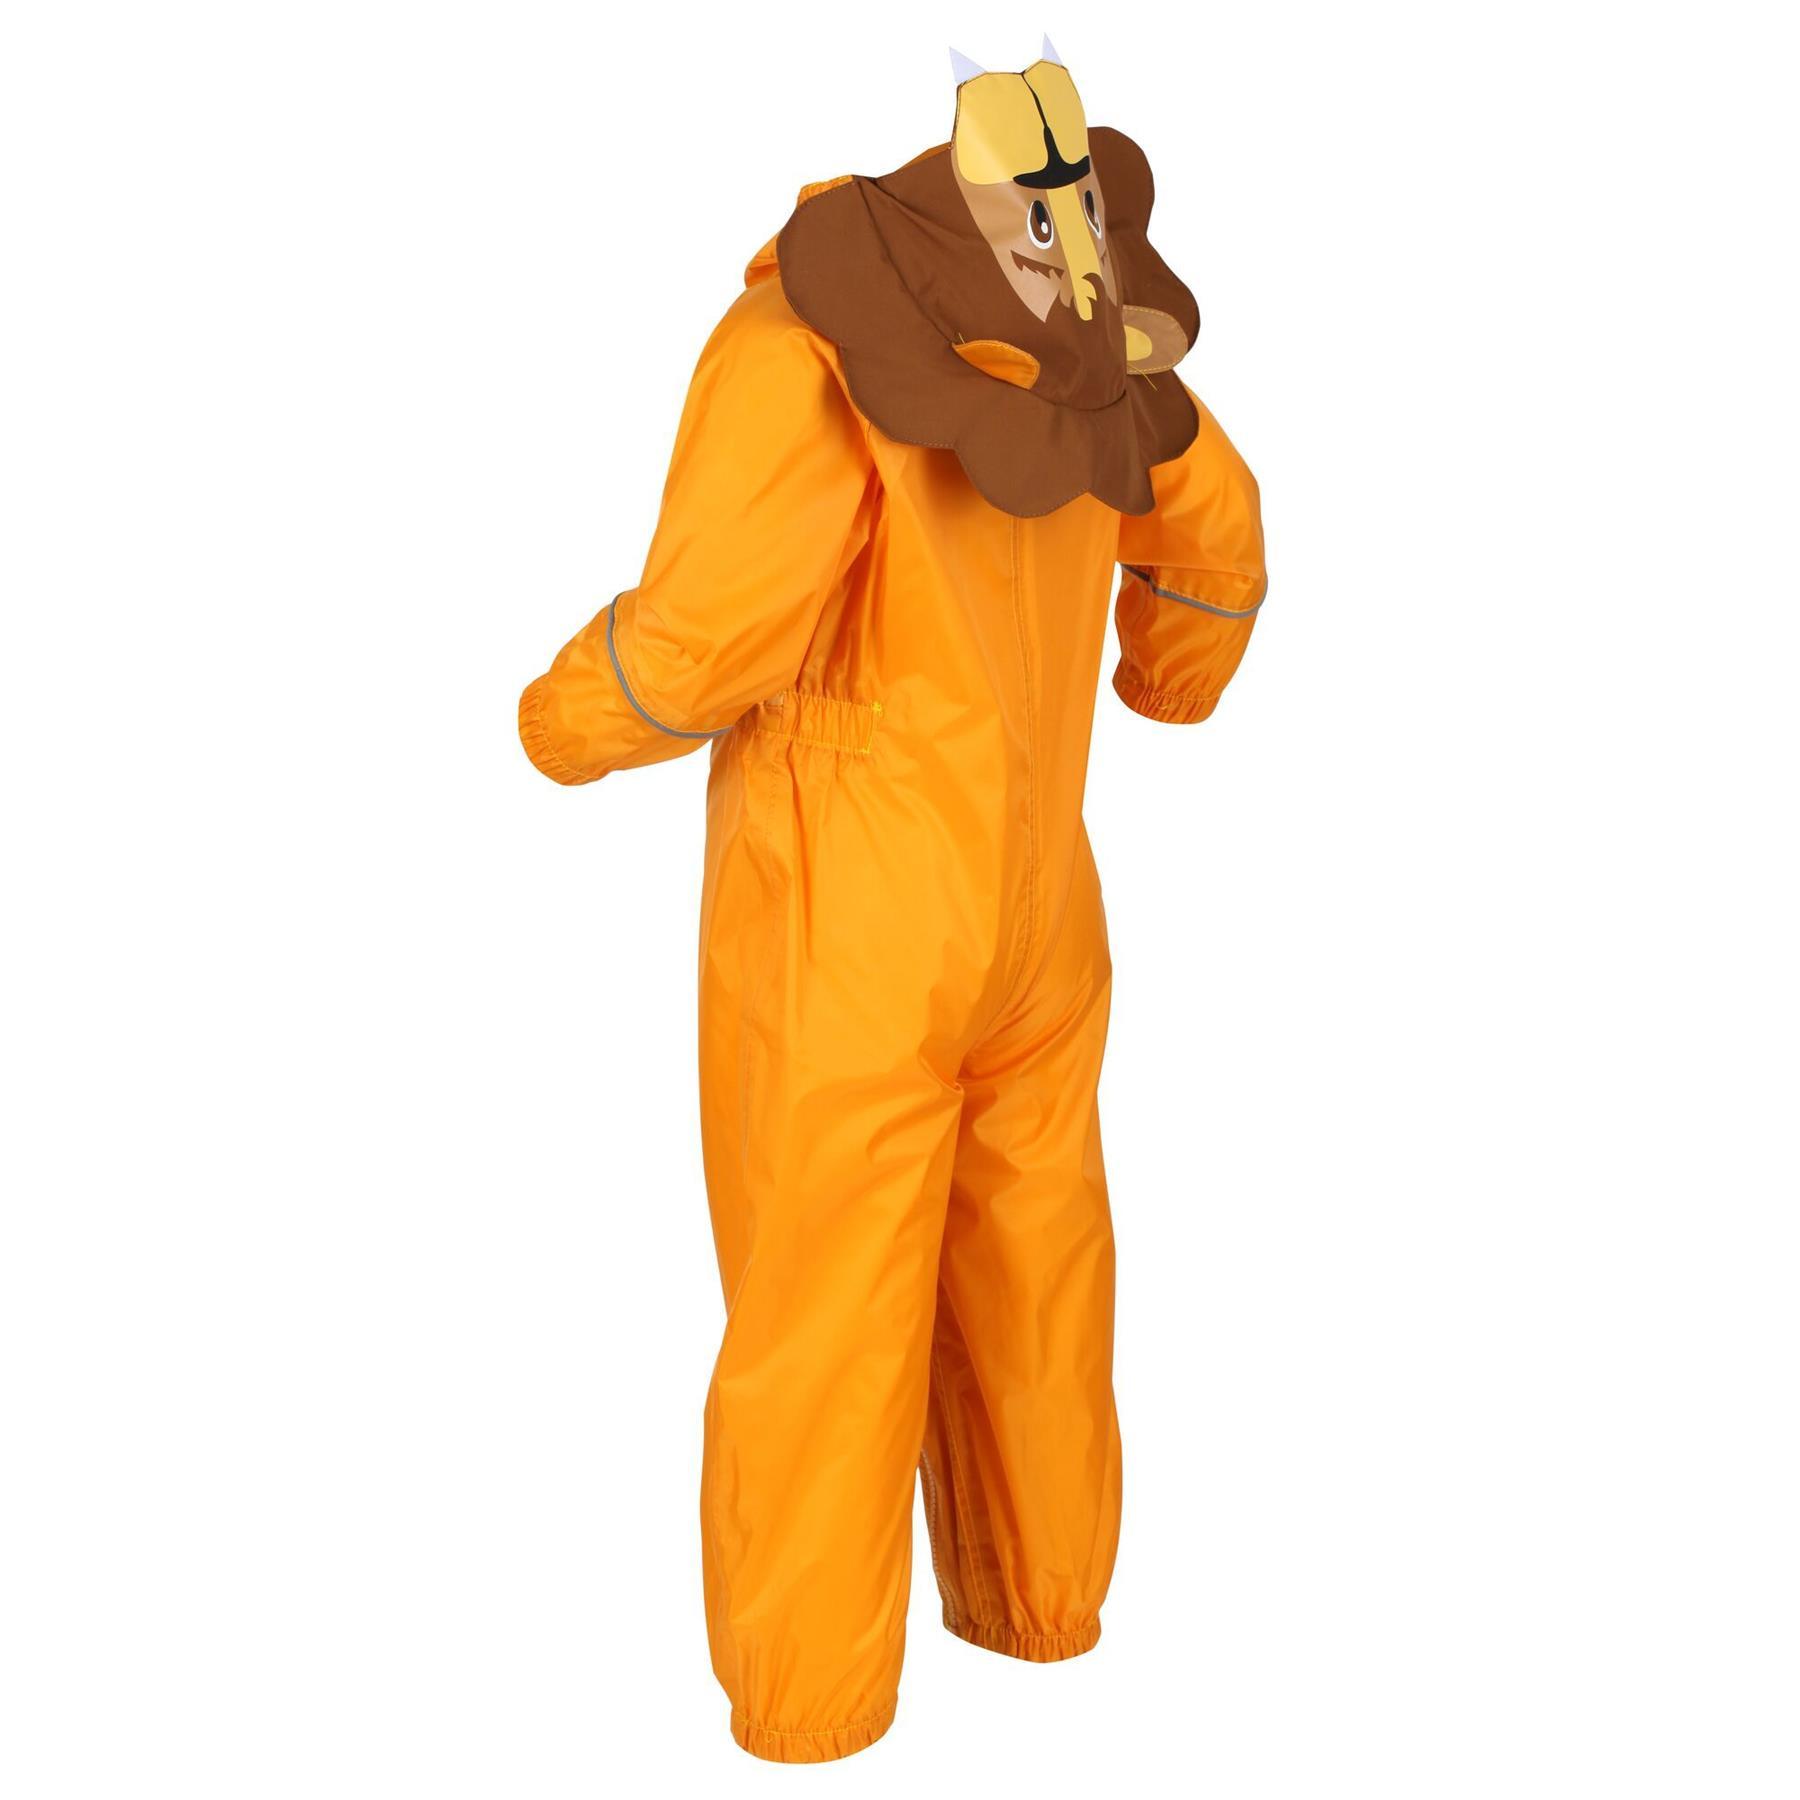 miniatuur 11 - Regatta Kids Charco All in Onezee Waterproof Puddle Suit Animal style Boys Girls